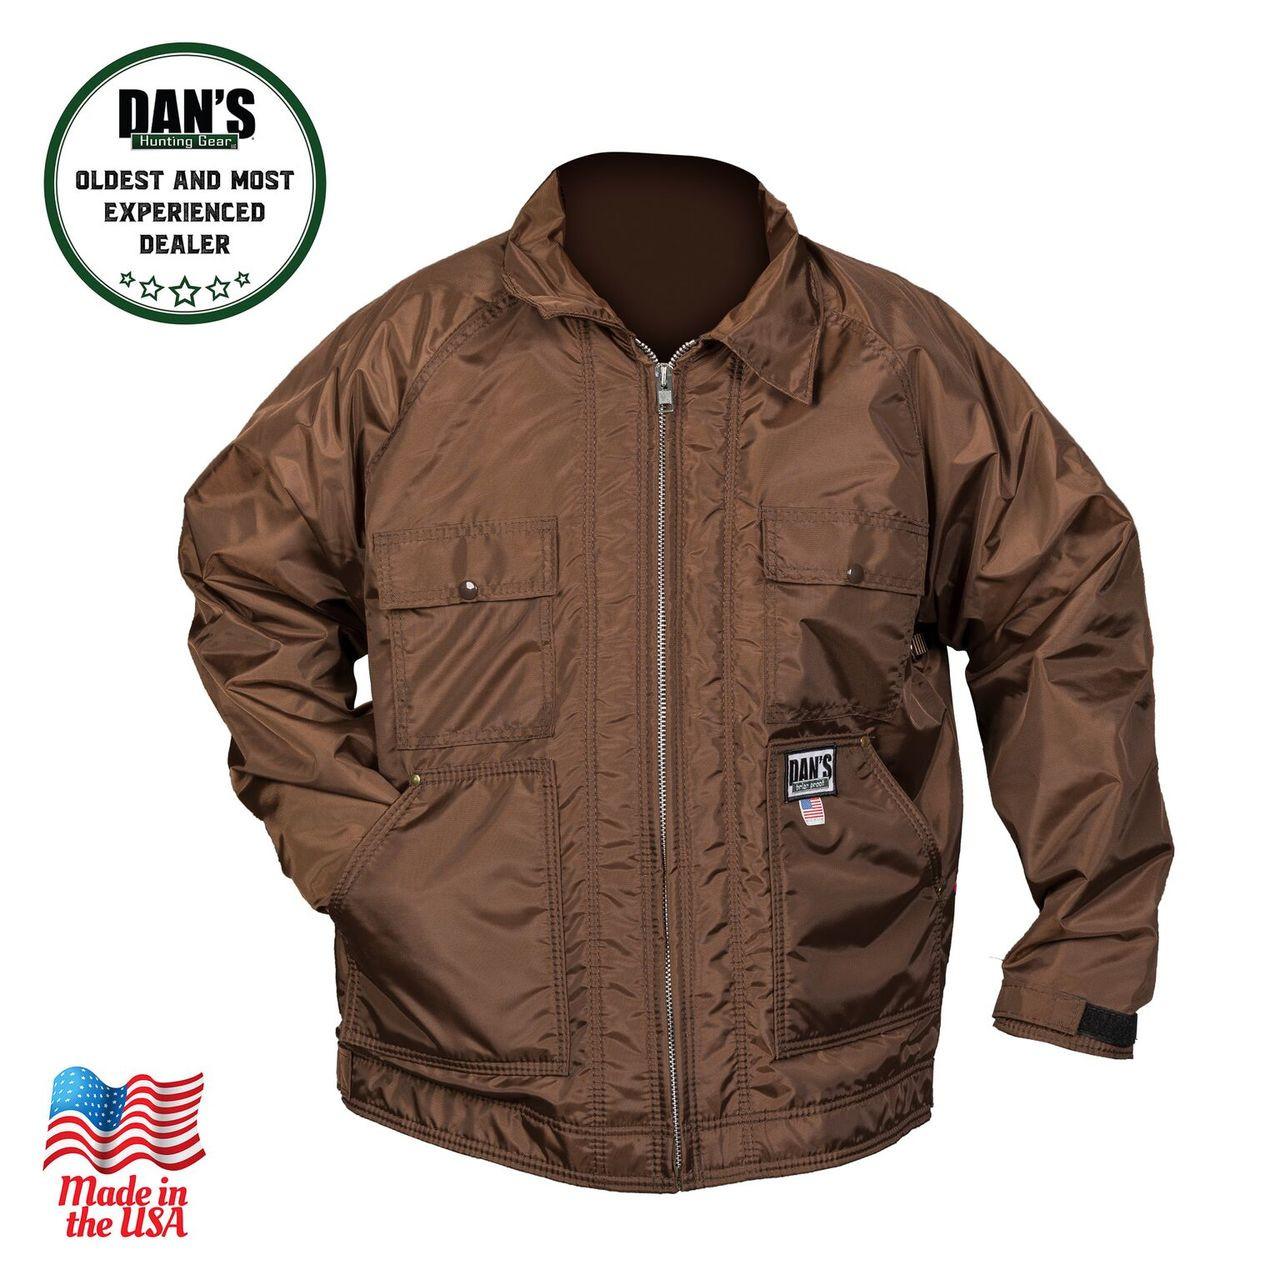 bce83fd42732a Dan's Hunting Gear - 401 - Sportsman's Choice Coat| Waterproof Hunting Coat  | Briarproof